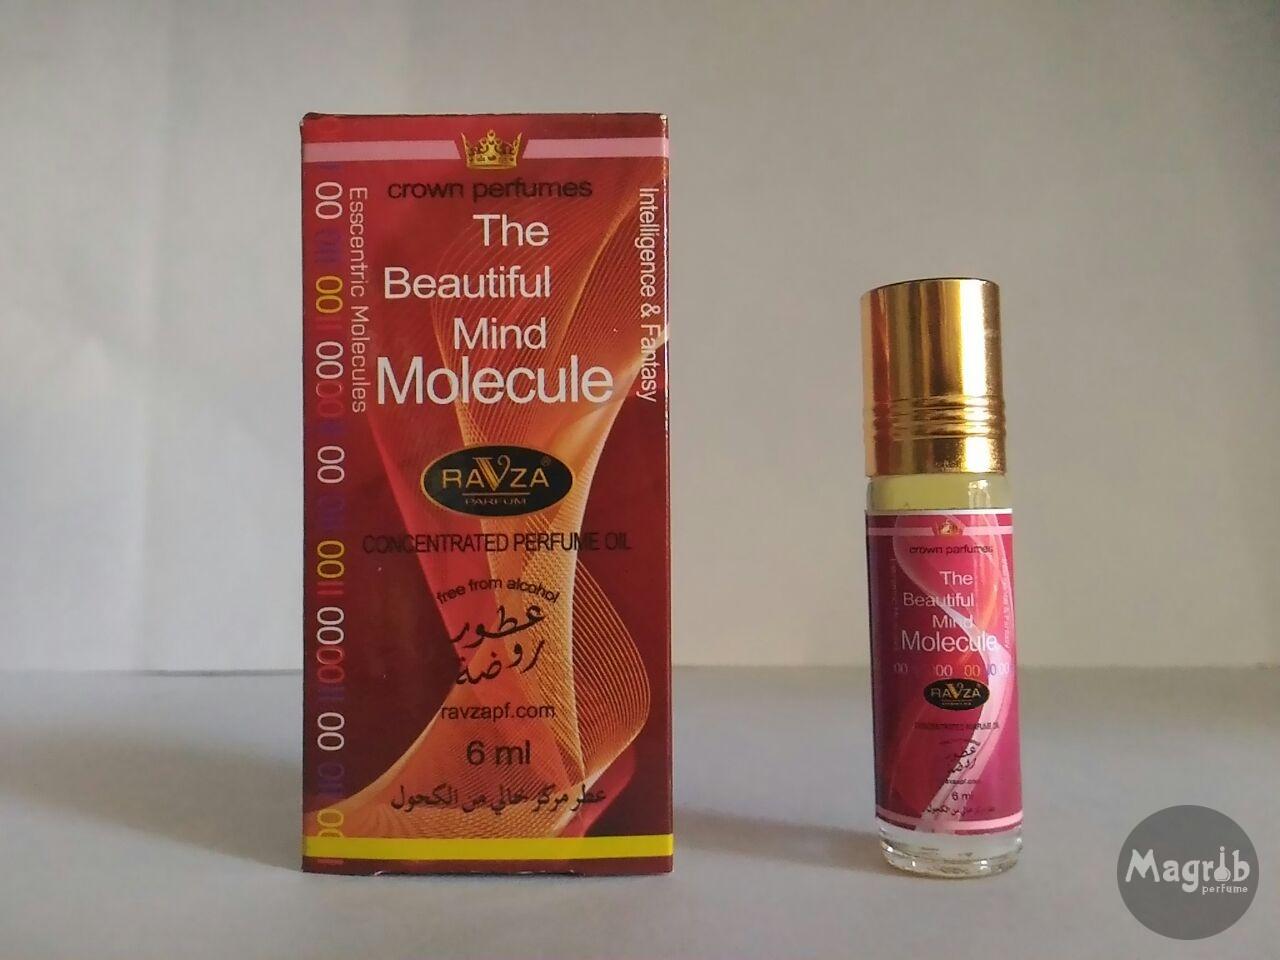 Ravza-Molecule Mind 6ml- масляные духи, роллер.